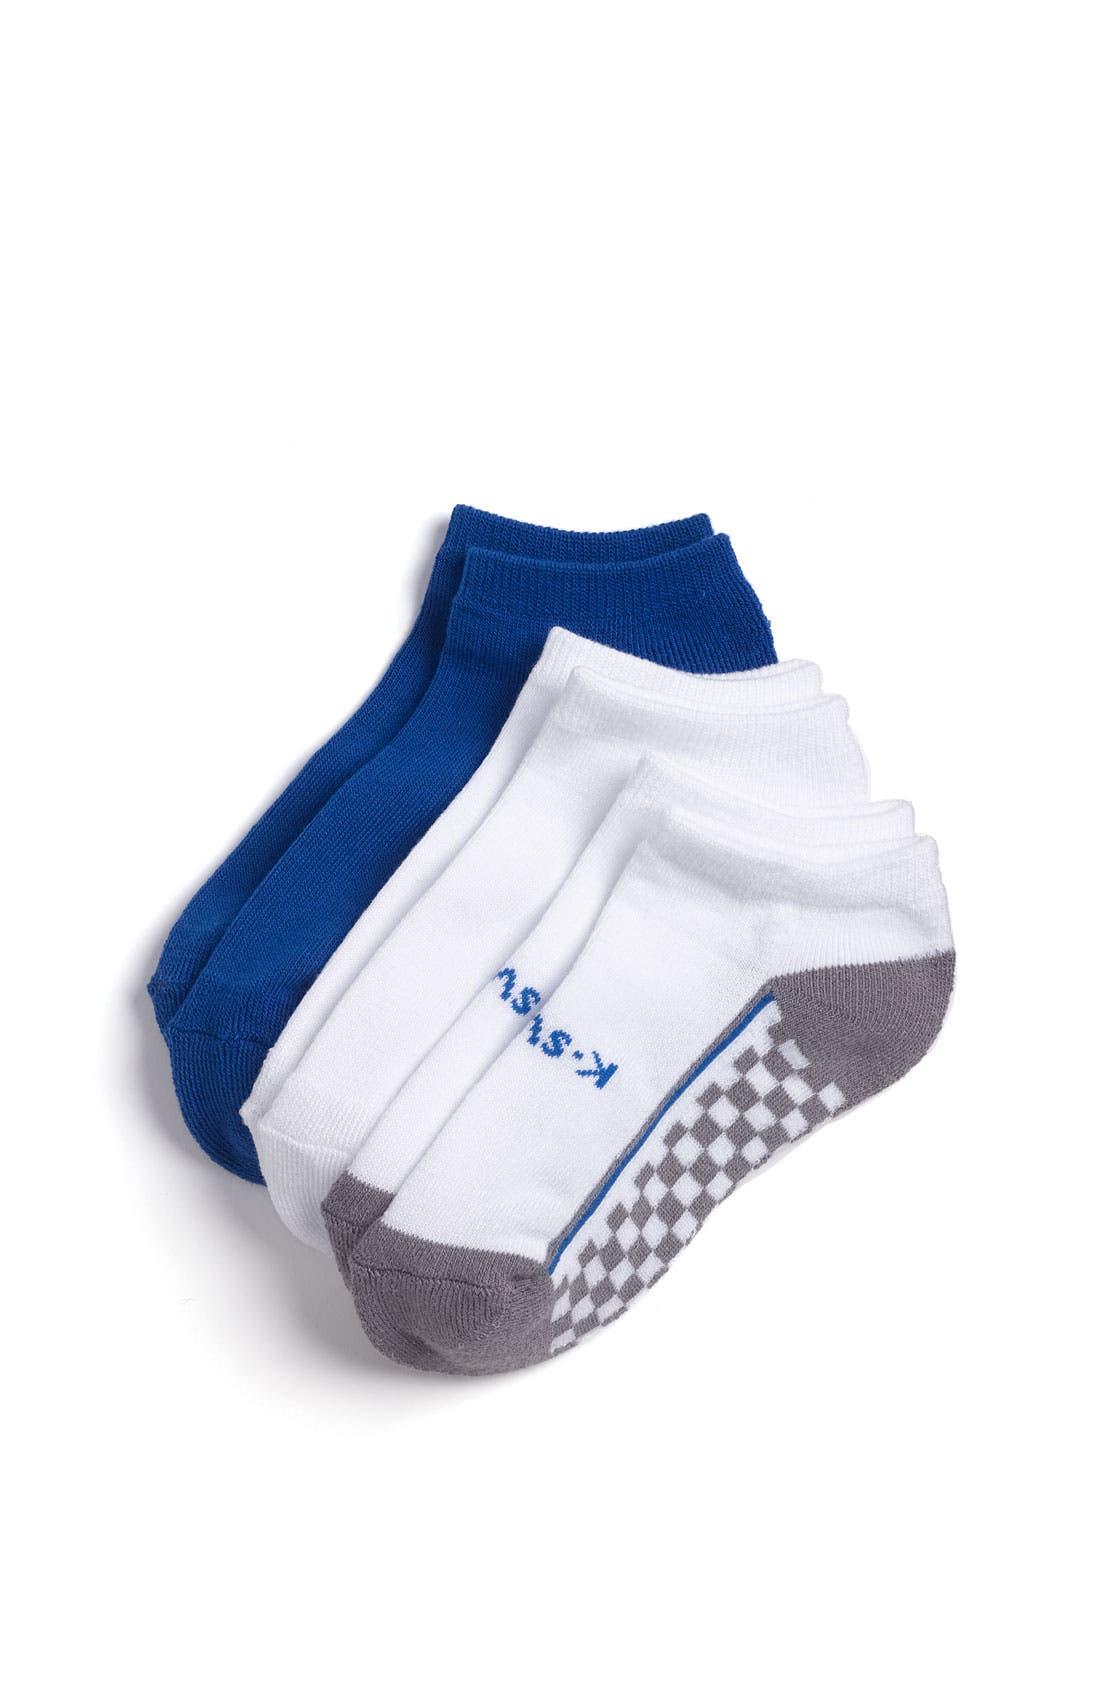 Alternate Image 1 Selected - K-Swiss 'Racing Check' Socks (3-Pack) (Big Boys)